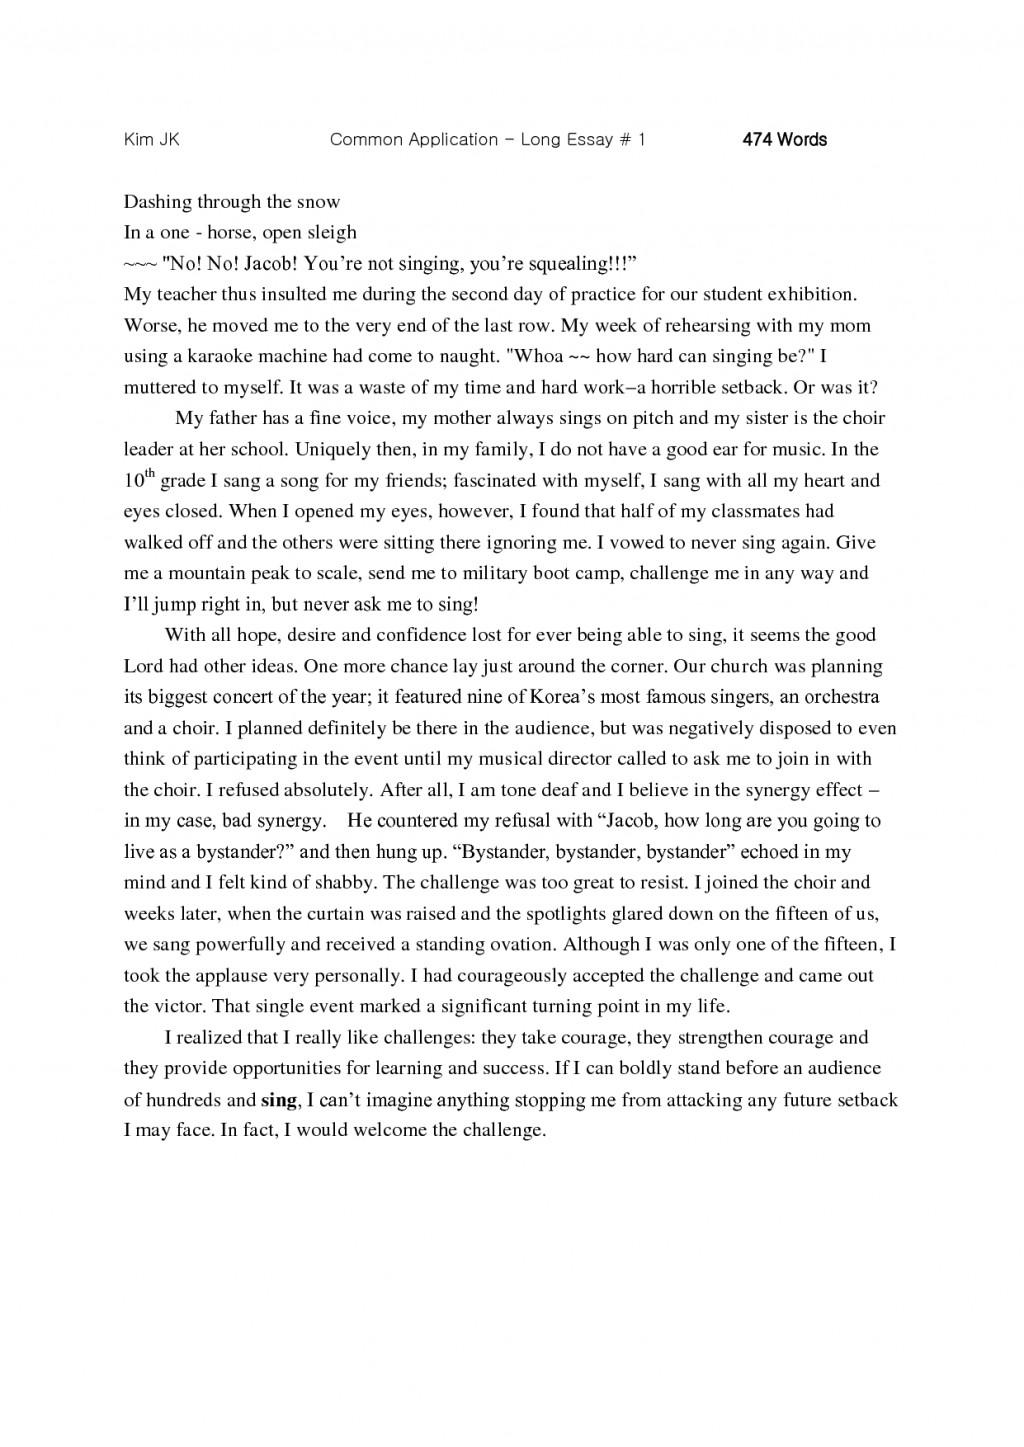 001 Essay Example Brilliant Ideas Of Collegepplication Examples Format Targer Golden Dragon Fantastic Good Commonpp Essays Successful Dreaded Common App Dartmouth Reddit Ivy League Large